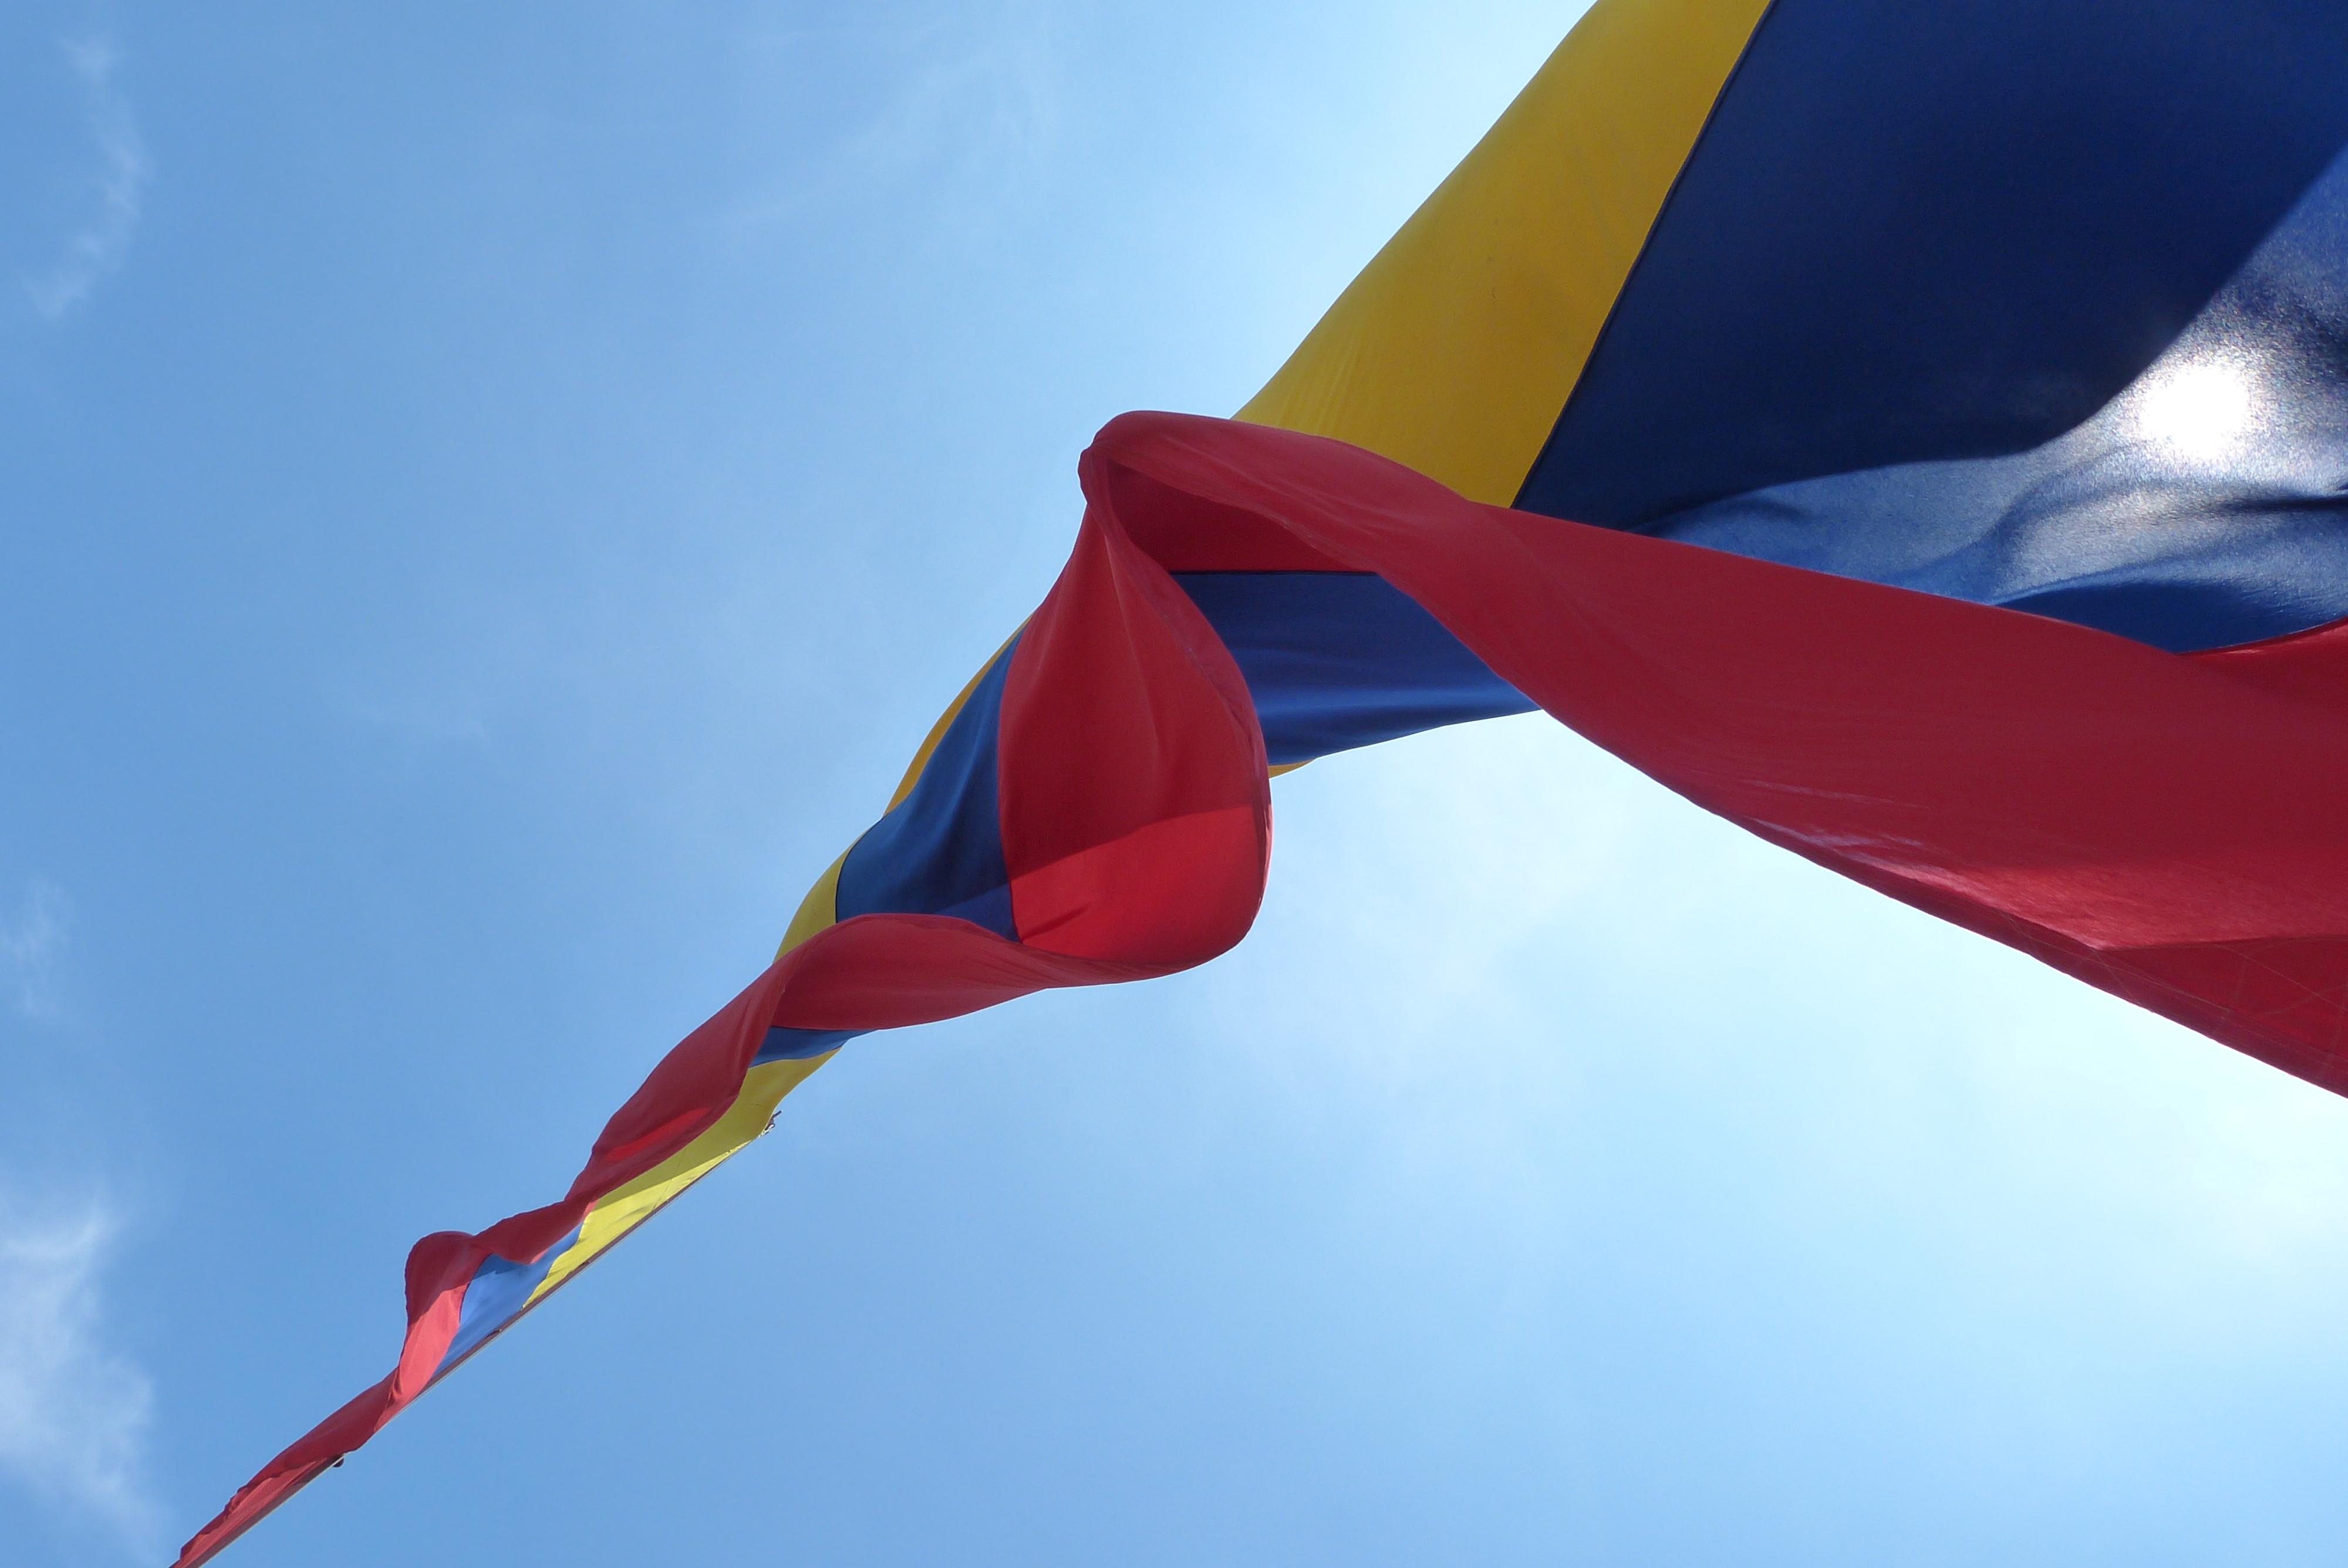 "<p>Флаг Колумбии. Фото: &copy; Flickr/<a href=""https://www.flickr.com/photos/yovengoasumar/"" title=""Go to yulian_franco's photostream"" data-track=""attributionNameClick"" data-rapid_p=""53"">yulian_franco</a></p>"